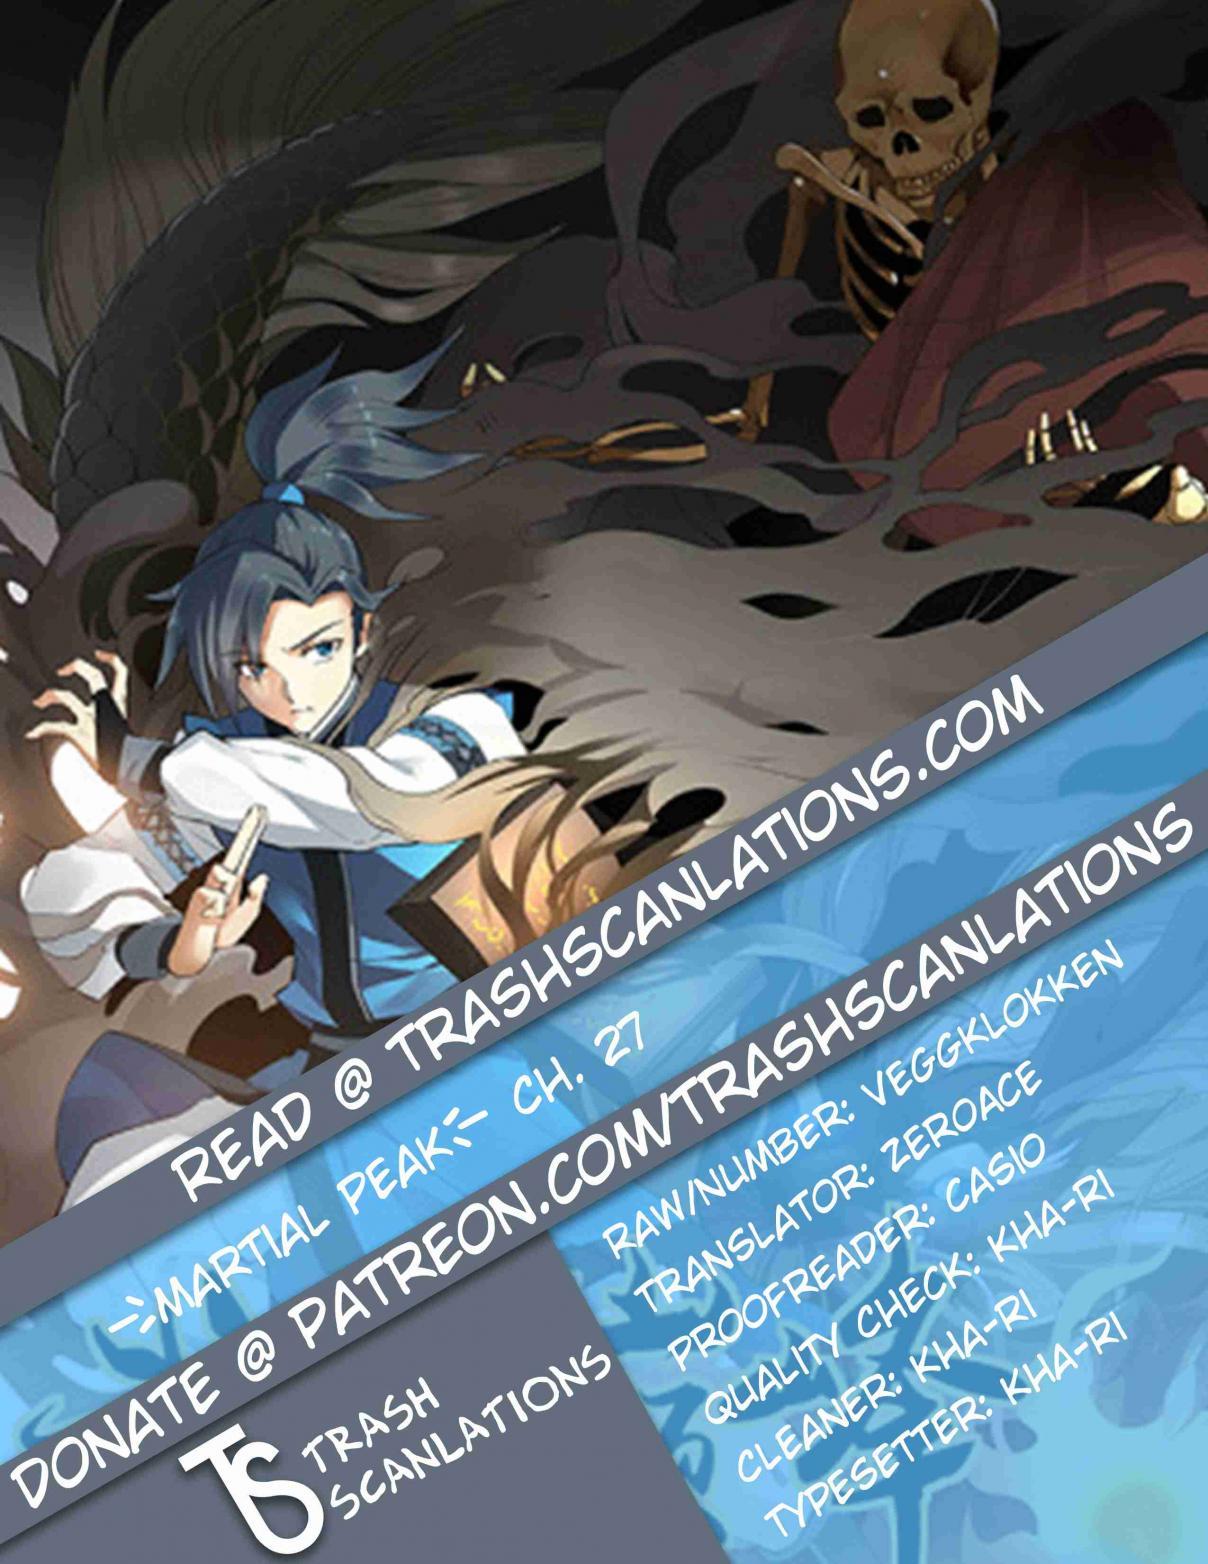 https://im.nineanime.com/comics/pic9/17/21329/480863/af434bae39933058cc4d35fb7a2e23b8.jpg Page 1